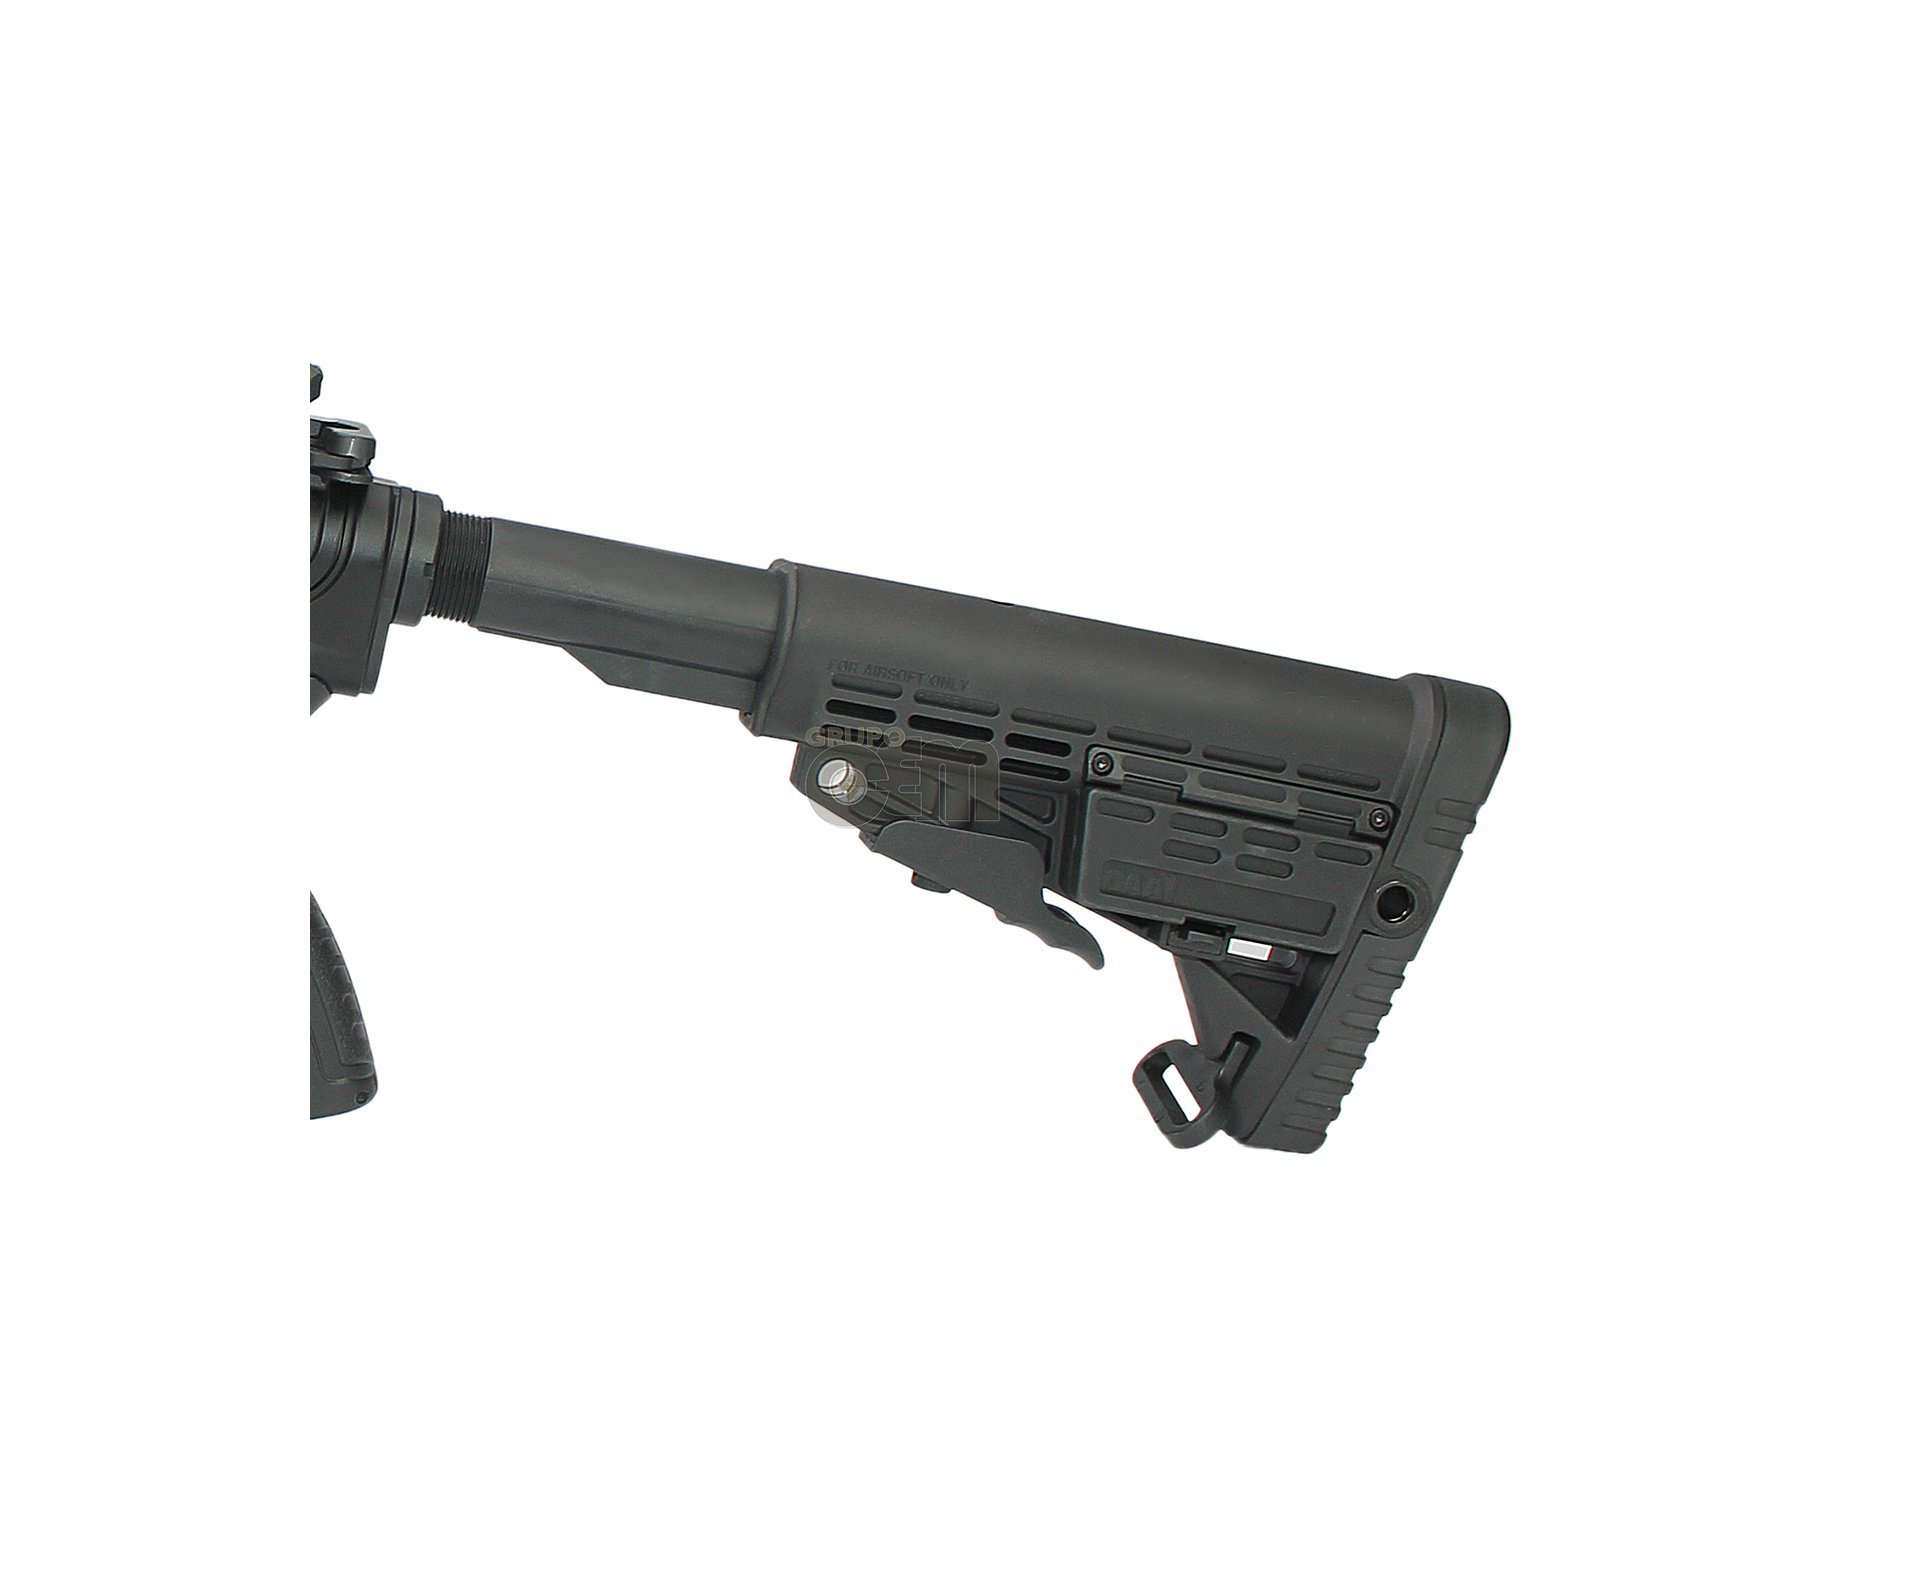 Rifle De Airsoft M4 Caa Cqb Custom Cal 6mm Bivolt - King Arms